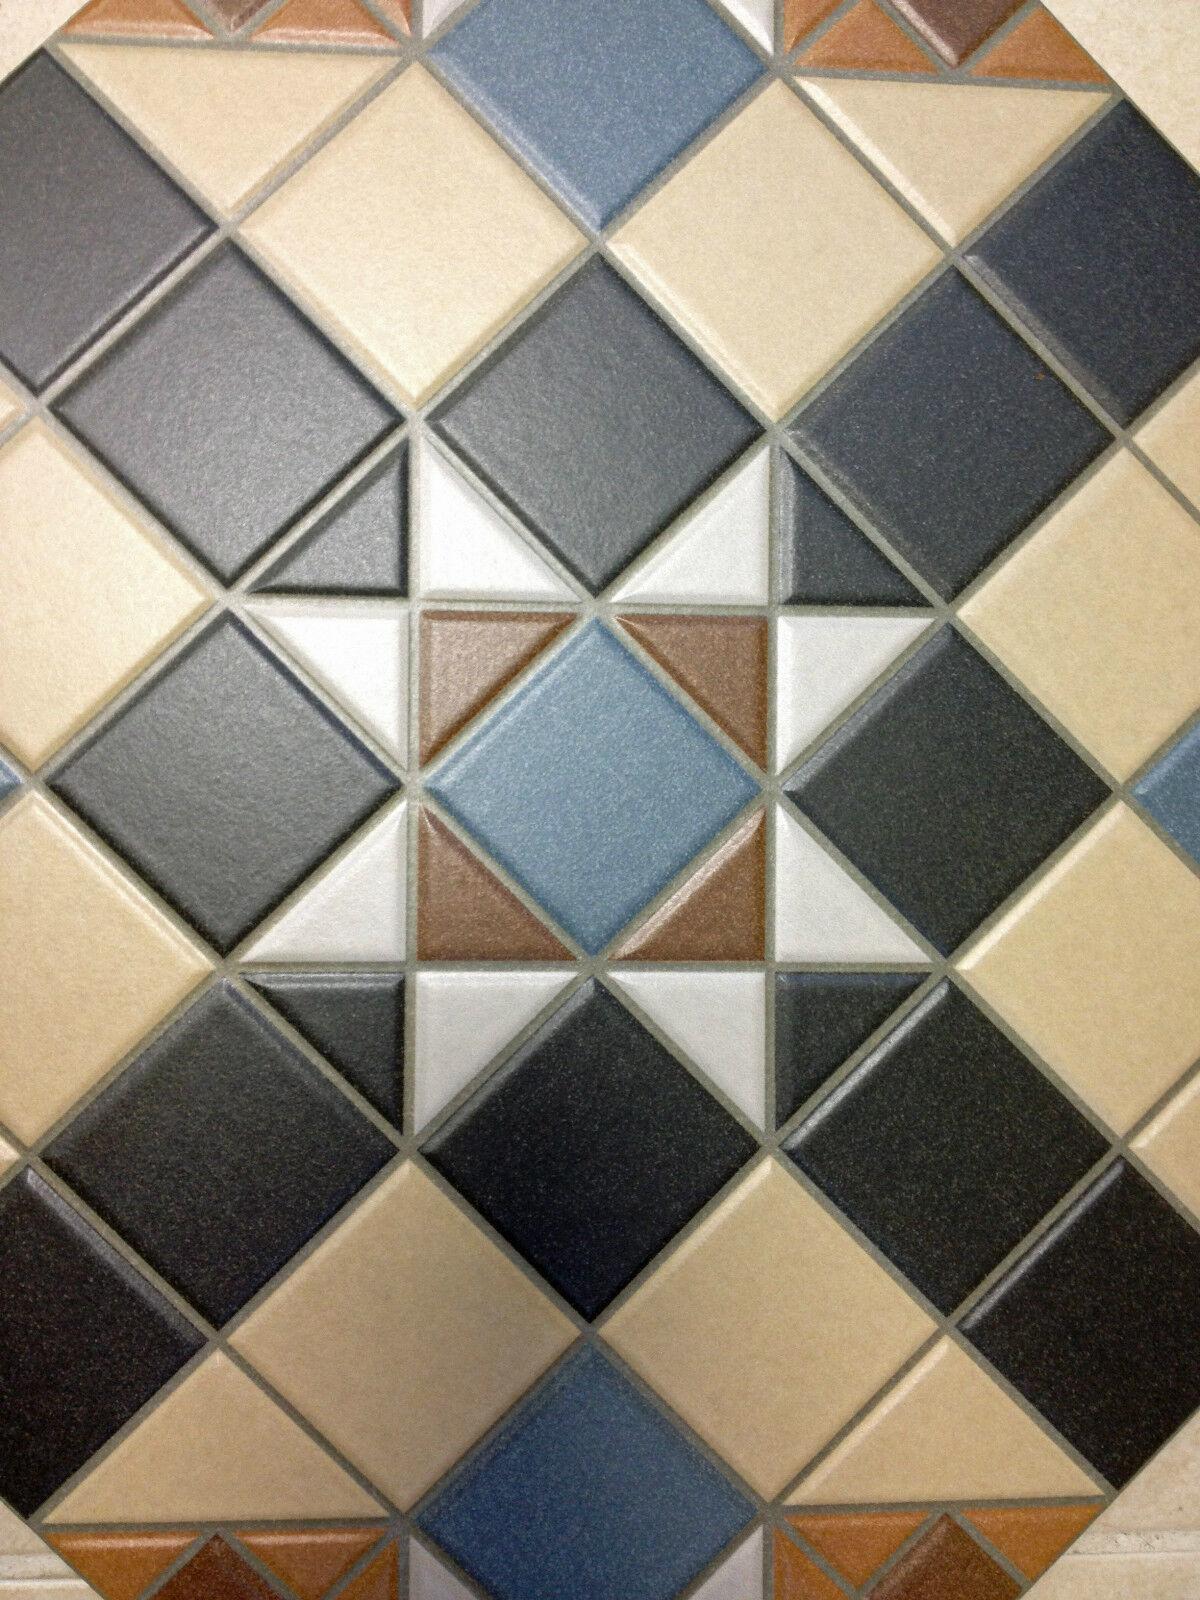 Reproduction Edwardian Floor Tiles - Rebellions